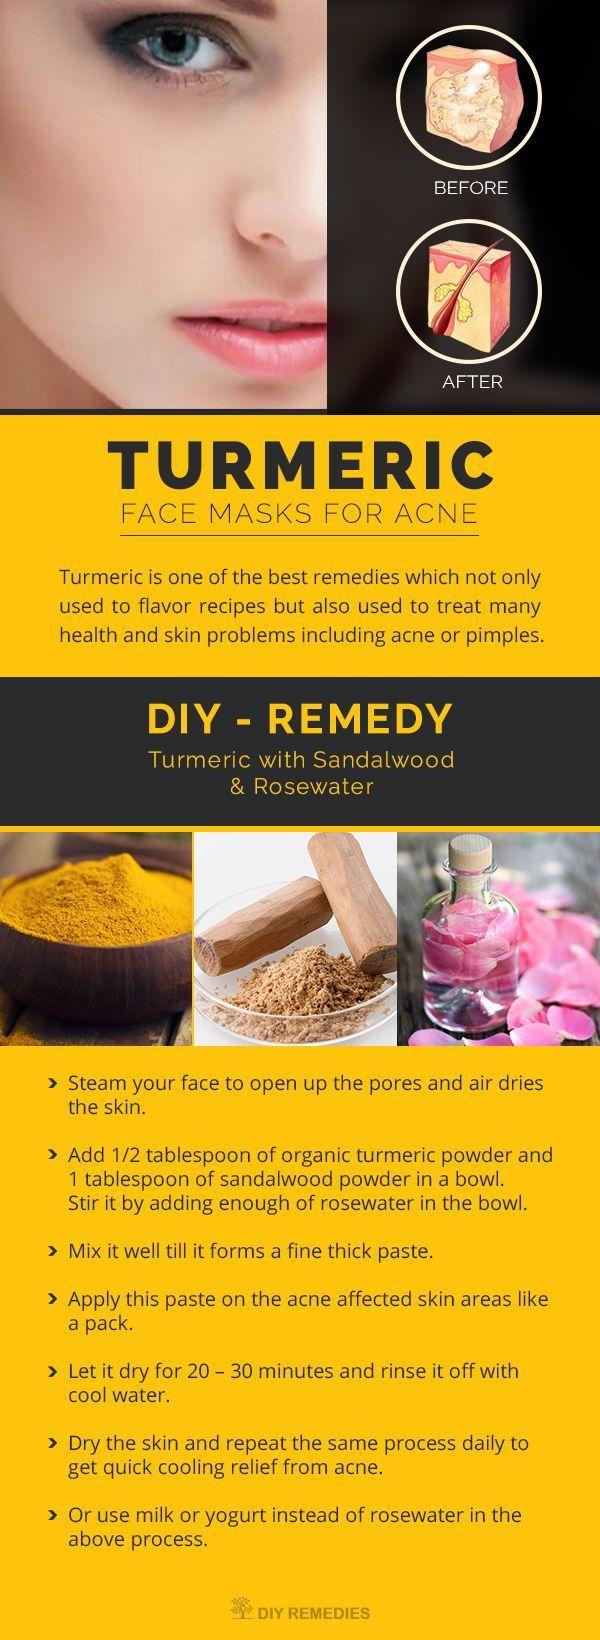 25+ best ideas about Turmeric face mask on Pinterest | Turmeric ...